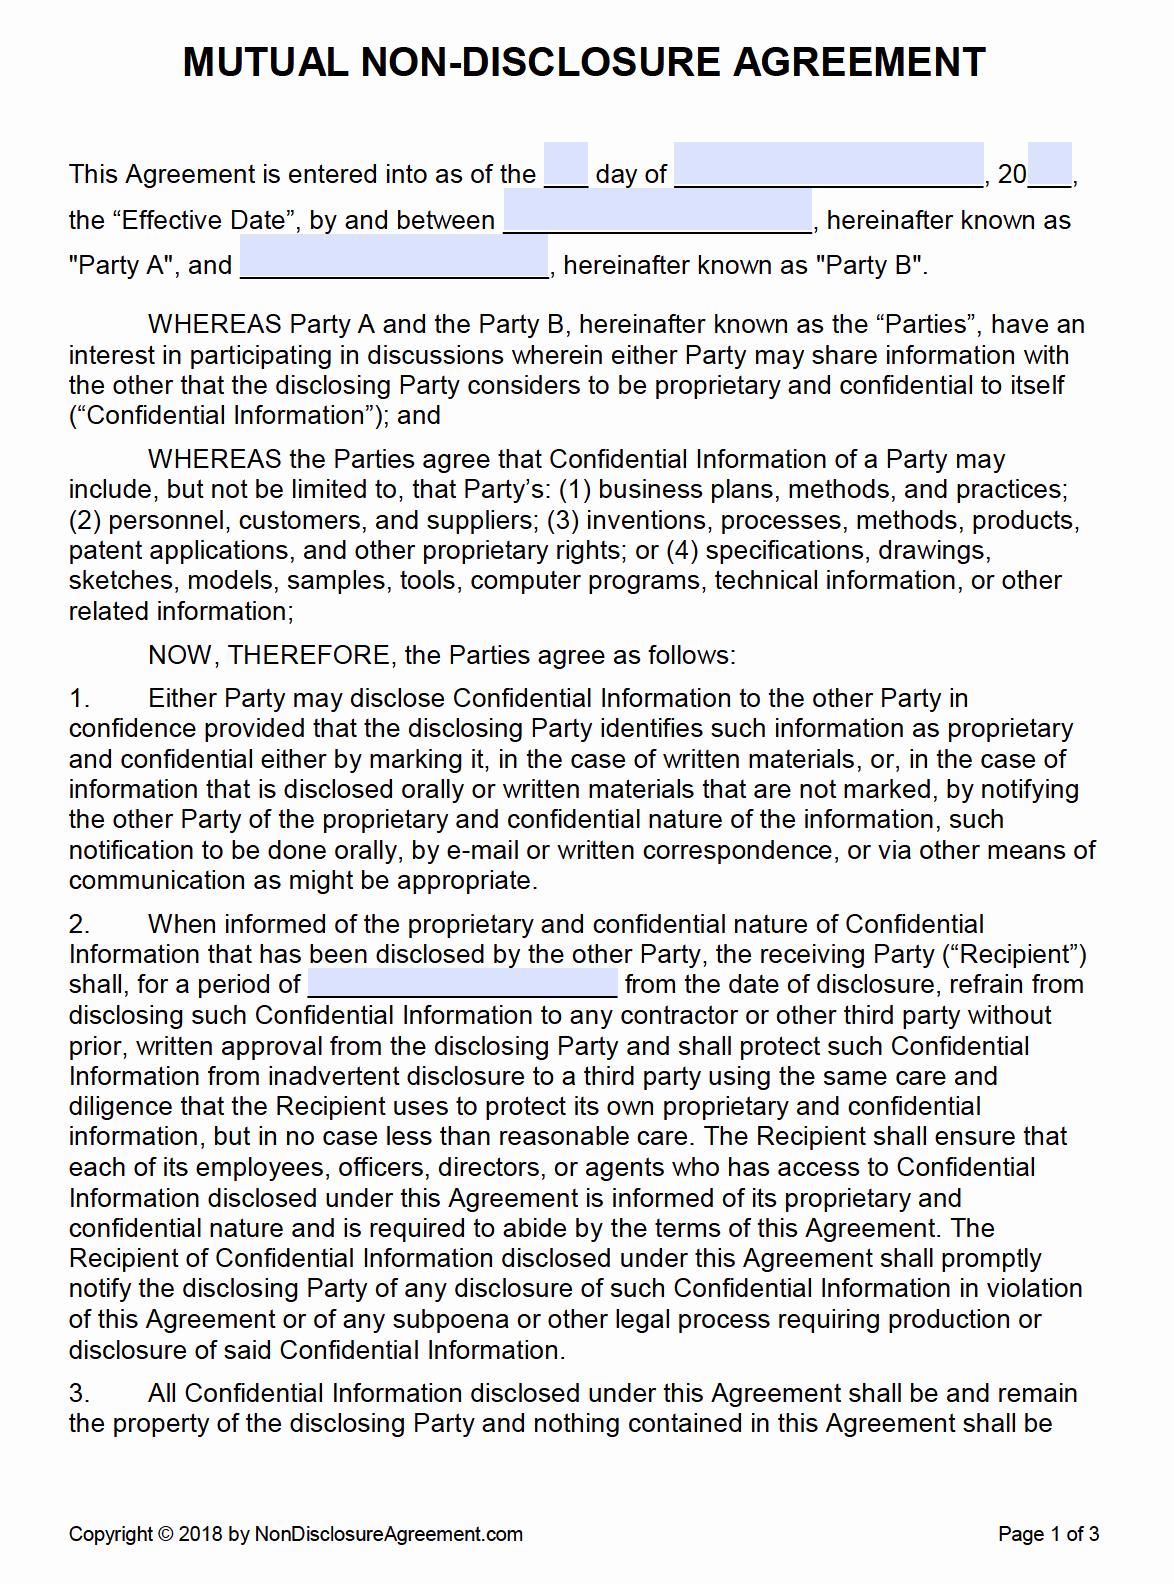 Non Disclosure Agreement Template Pdf Elegant Free Mutual Non Disclosure Agreement Nda Pdf